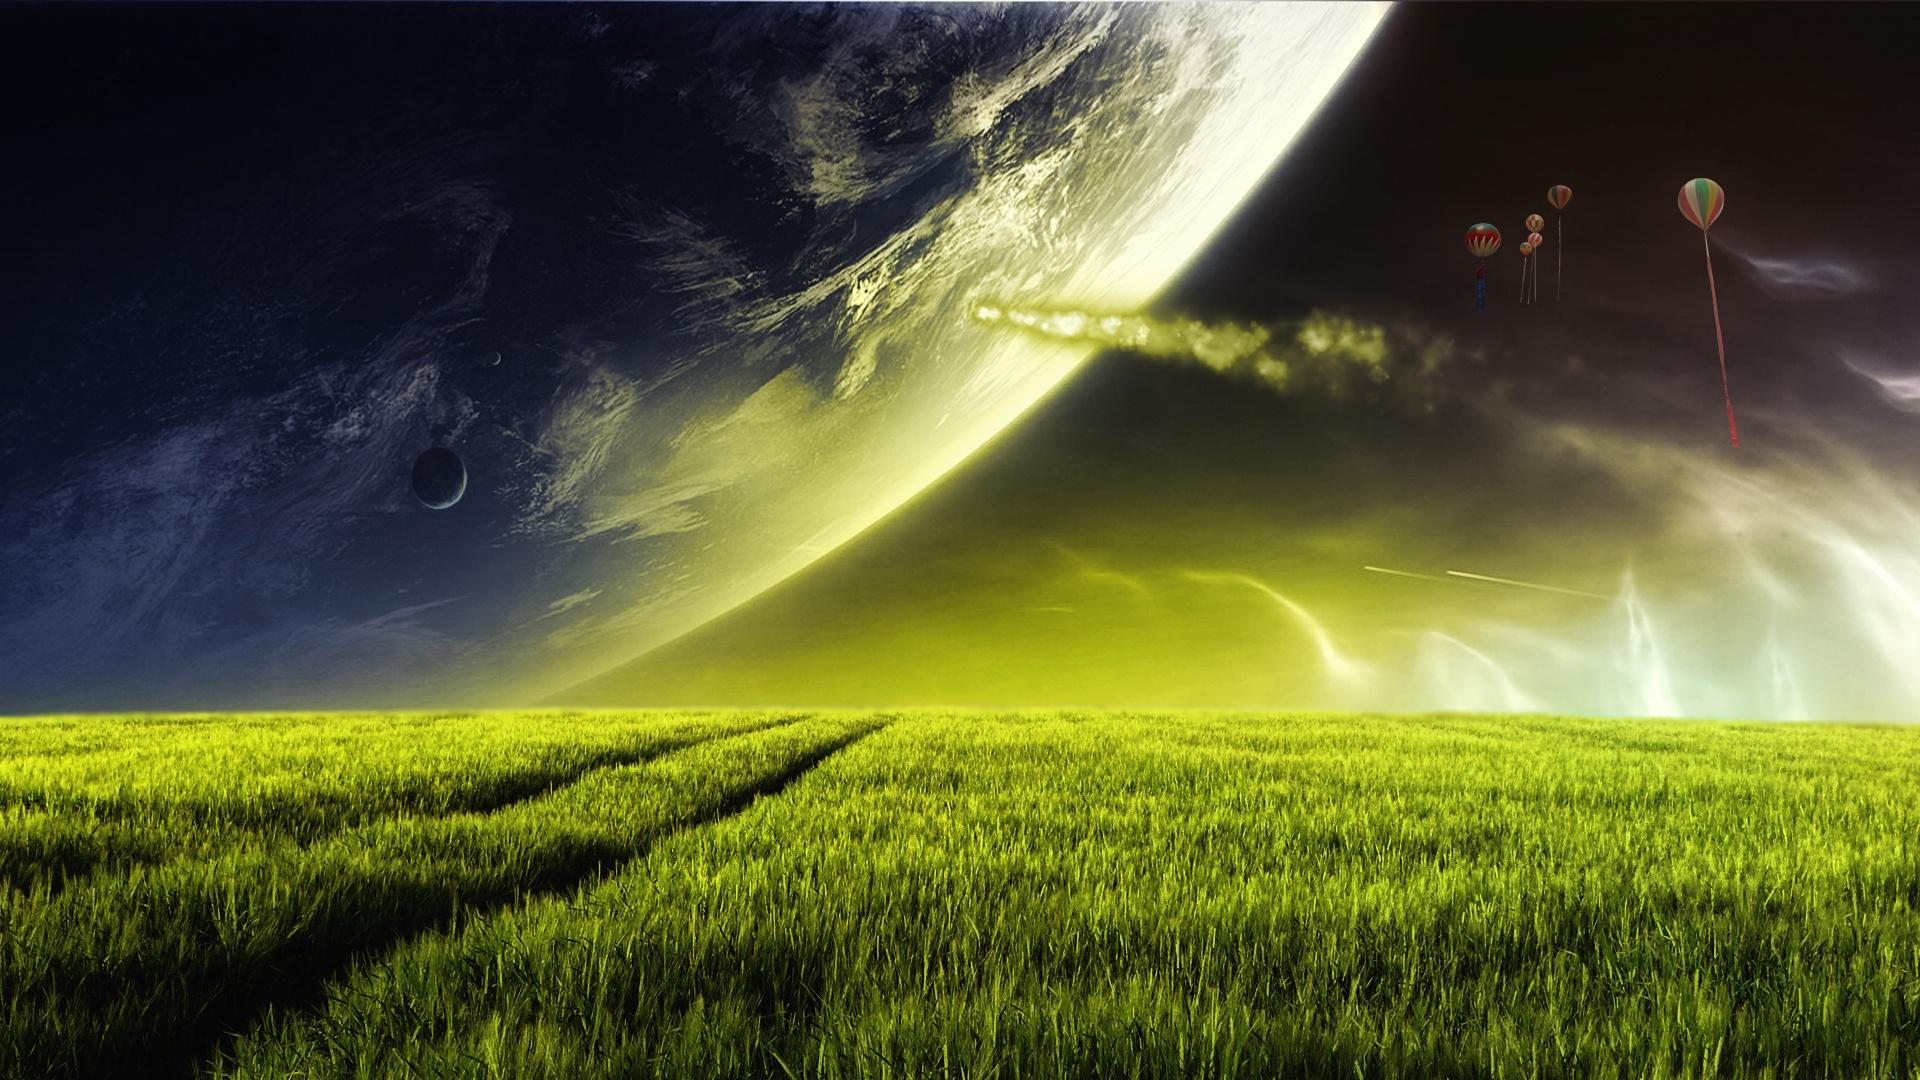 Alien Planet Wallpapers HD Wallpapers 1920x1080